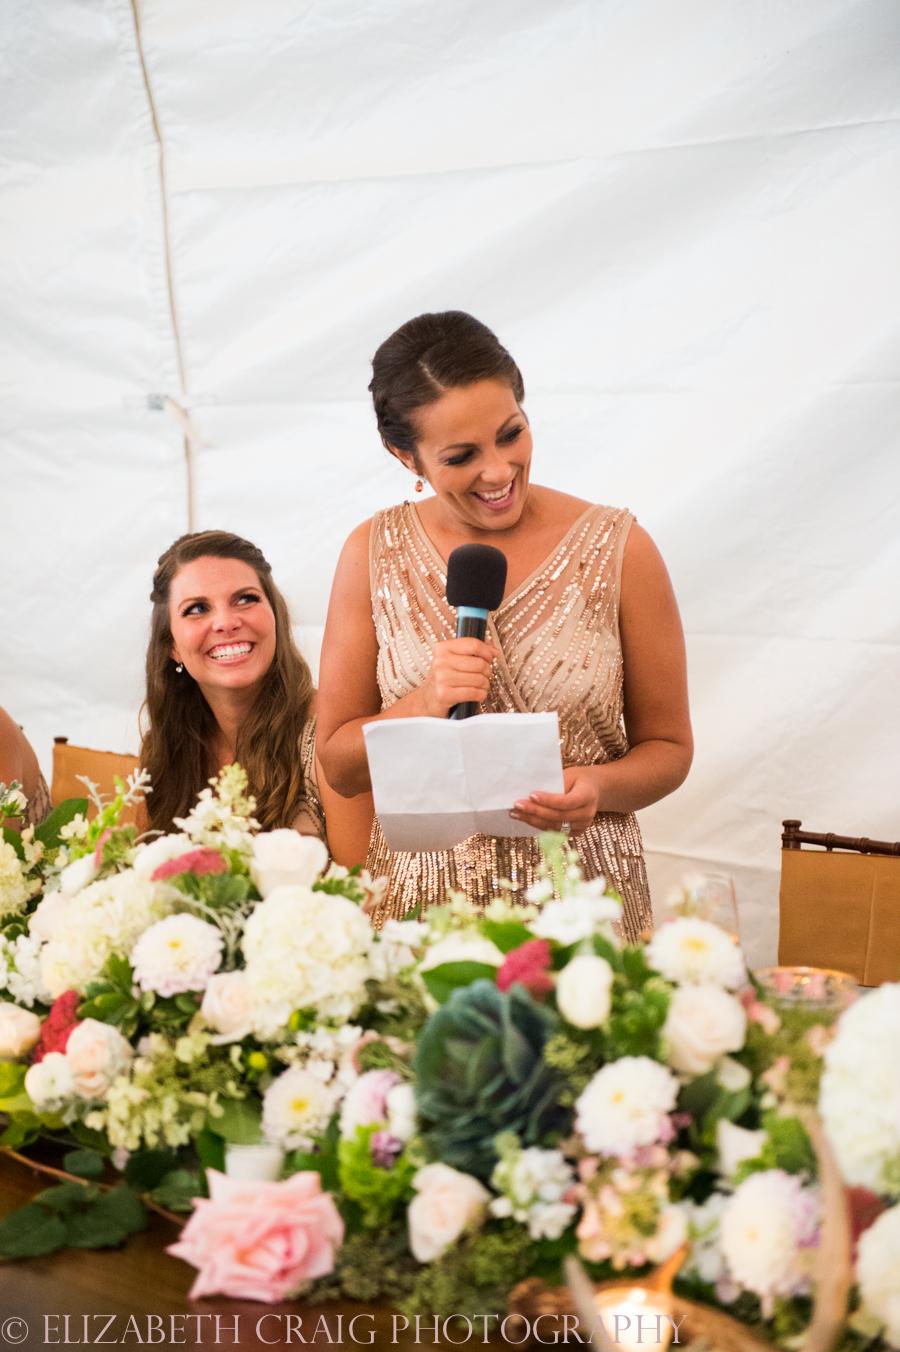 Dubois Brockway St. Marys PA Weddings-0212